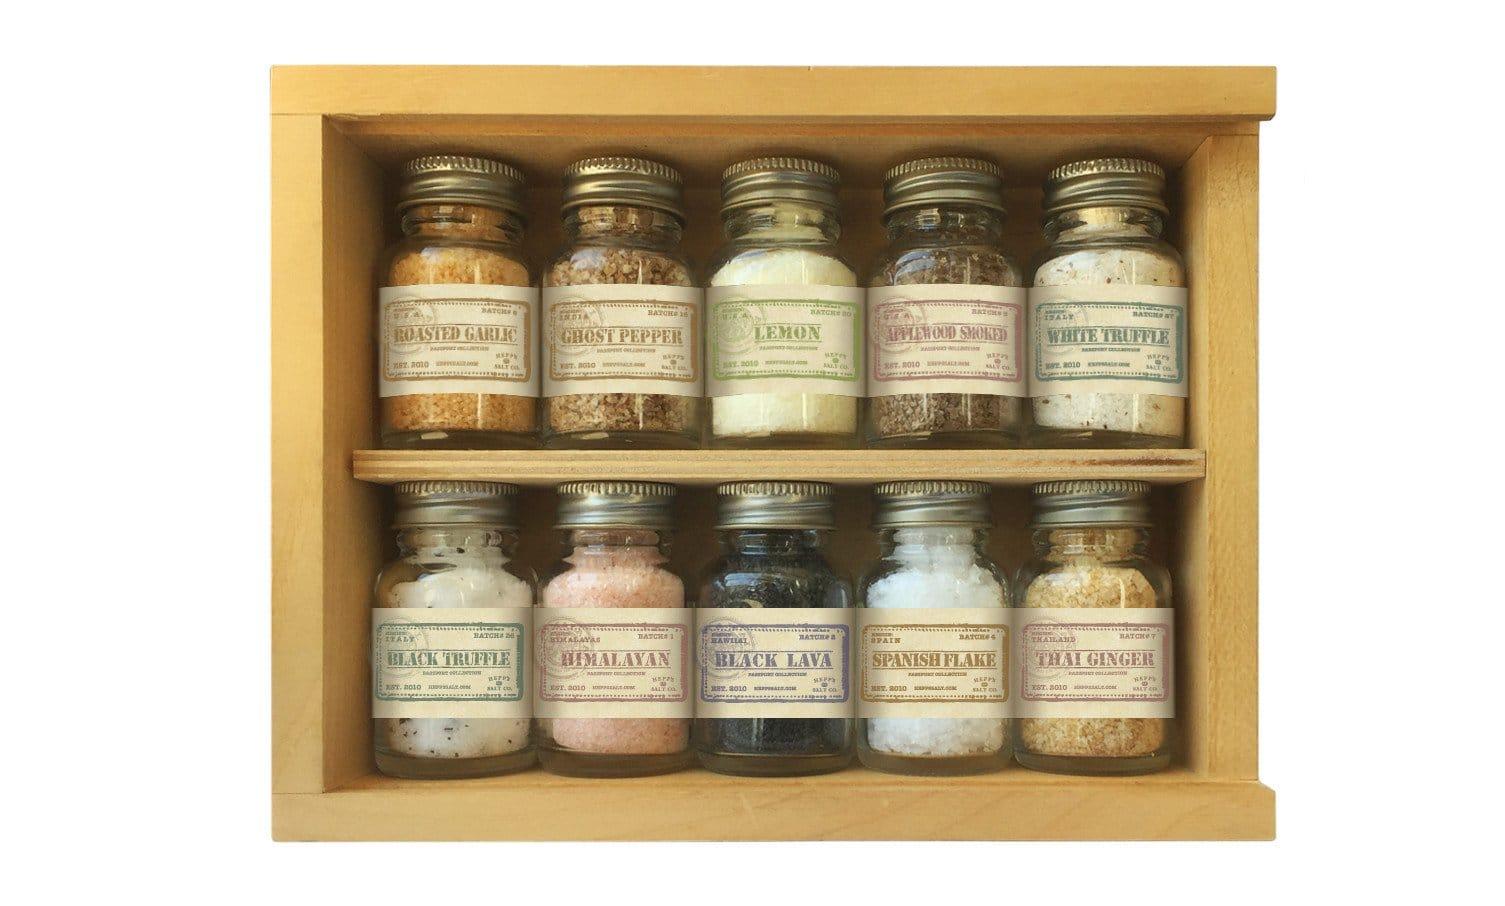 hepps passport collection of 10 different flavor salts